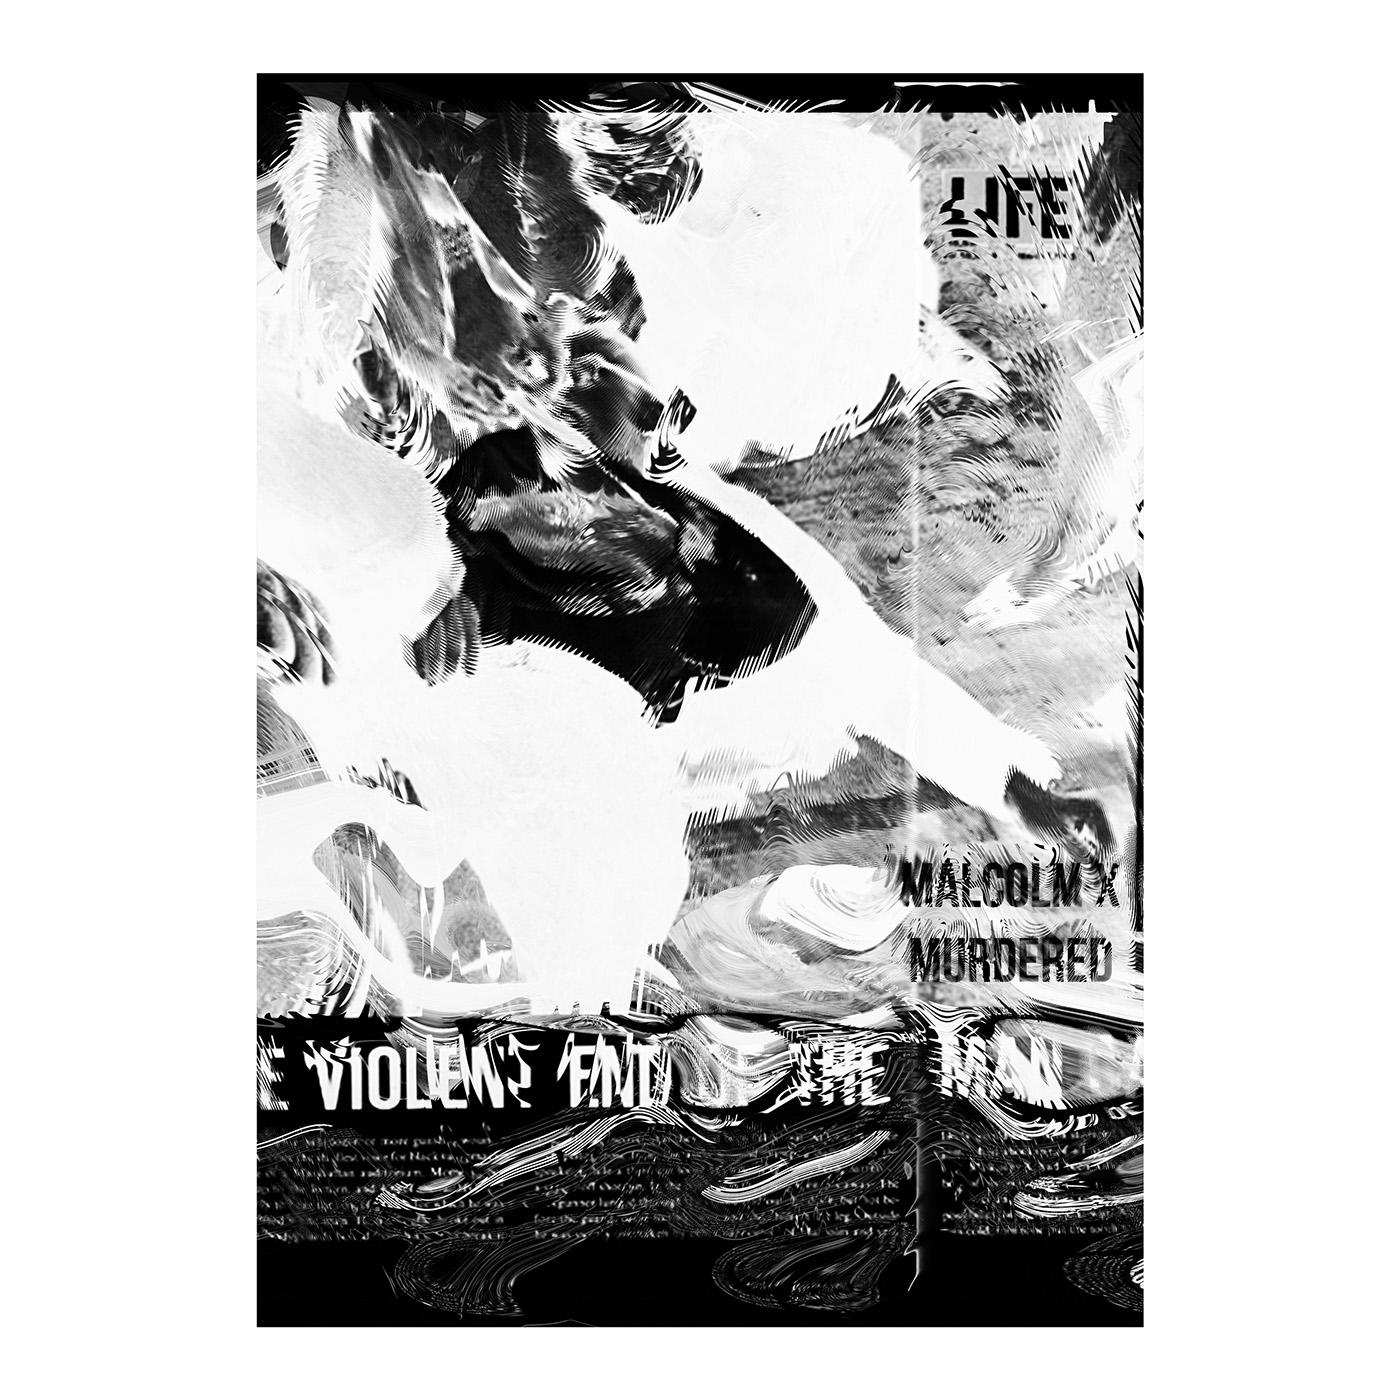 graphic design  Poster Design graphic Demagogue malcolm x JKF kennedy John Lennon